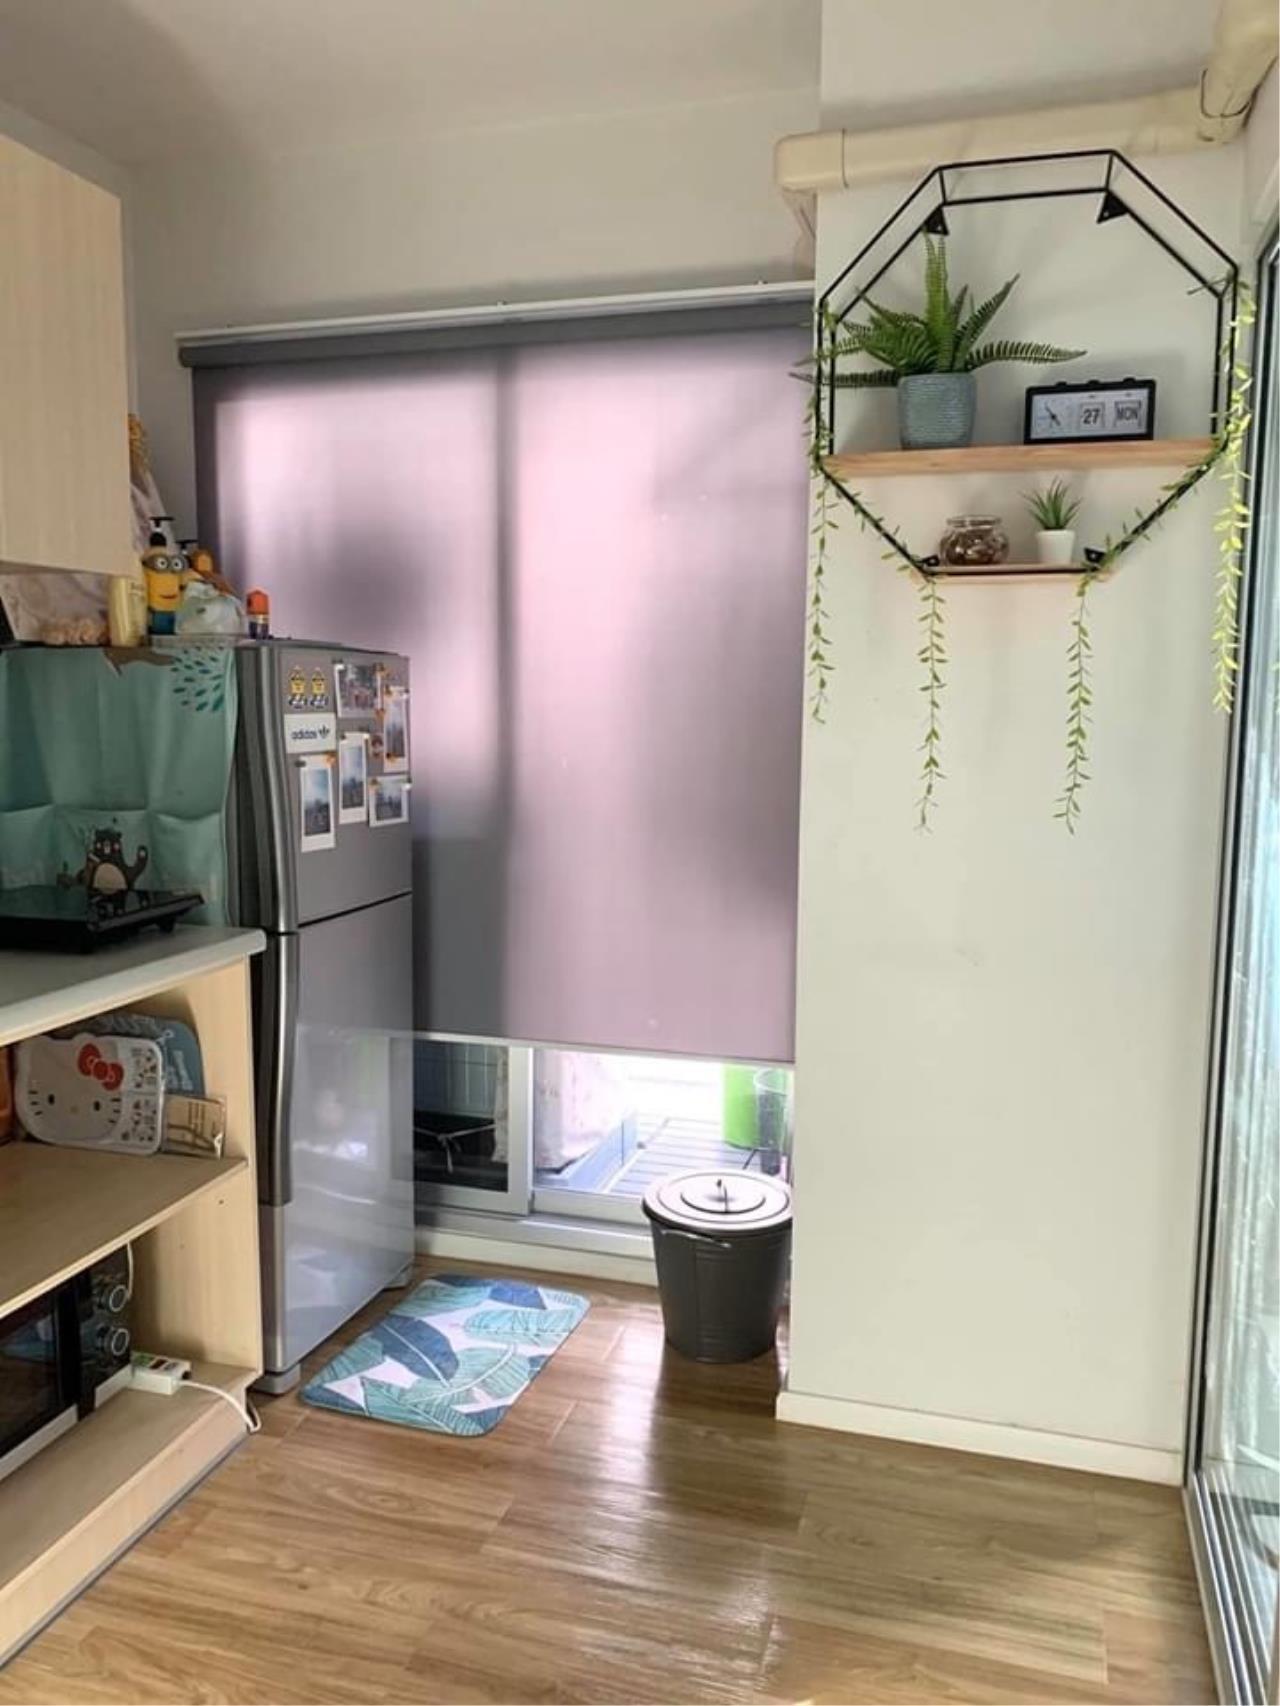 Agent - Phapayawarin Agency's ISSI Condo Suksawat for Sale, 1 Bedroom 1 Bathroom, 25 Sq.m. 5